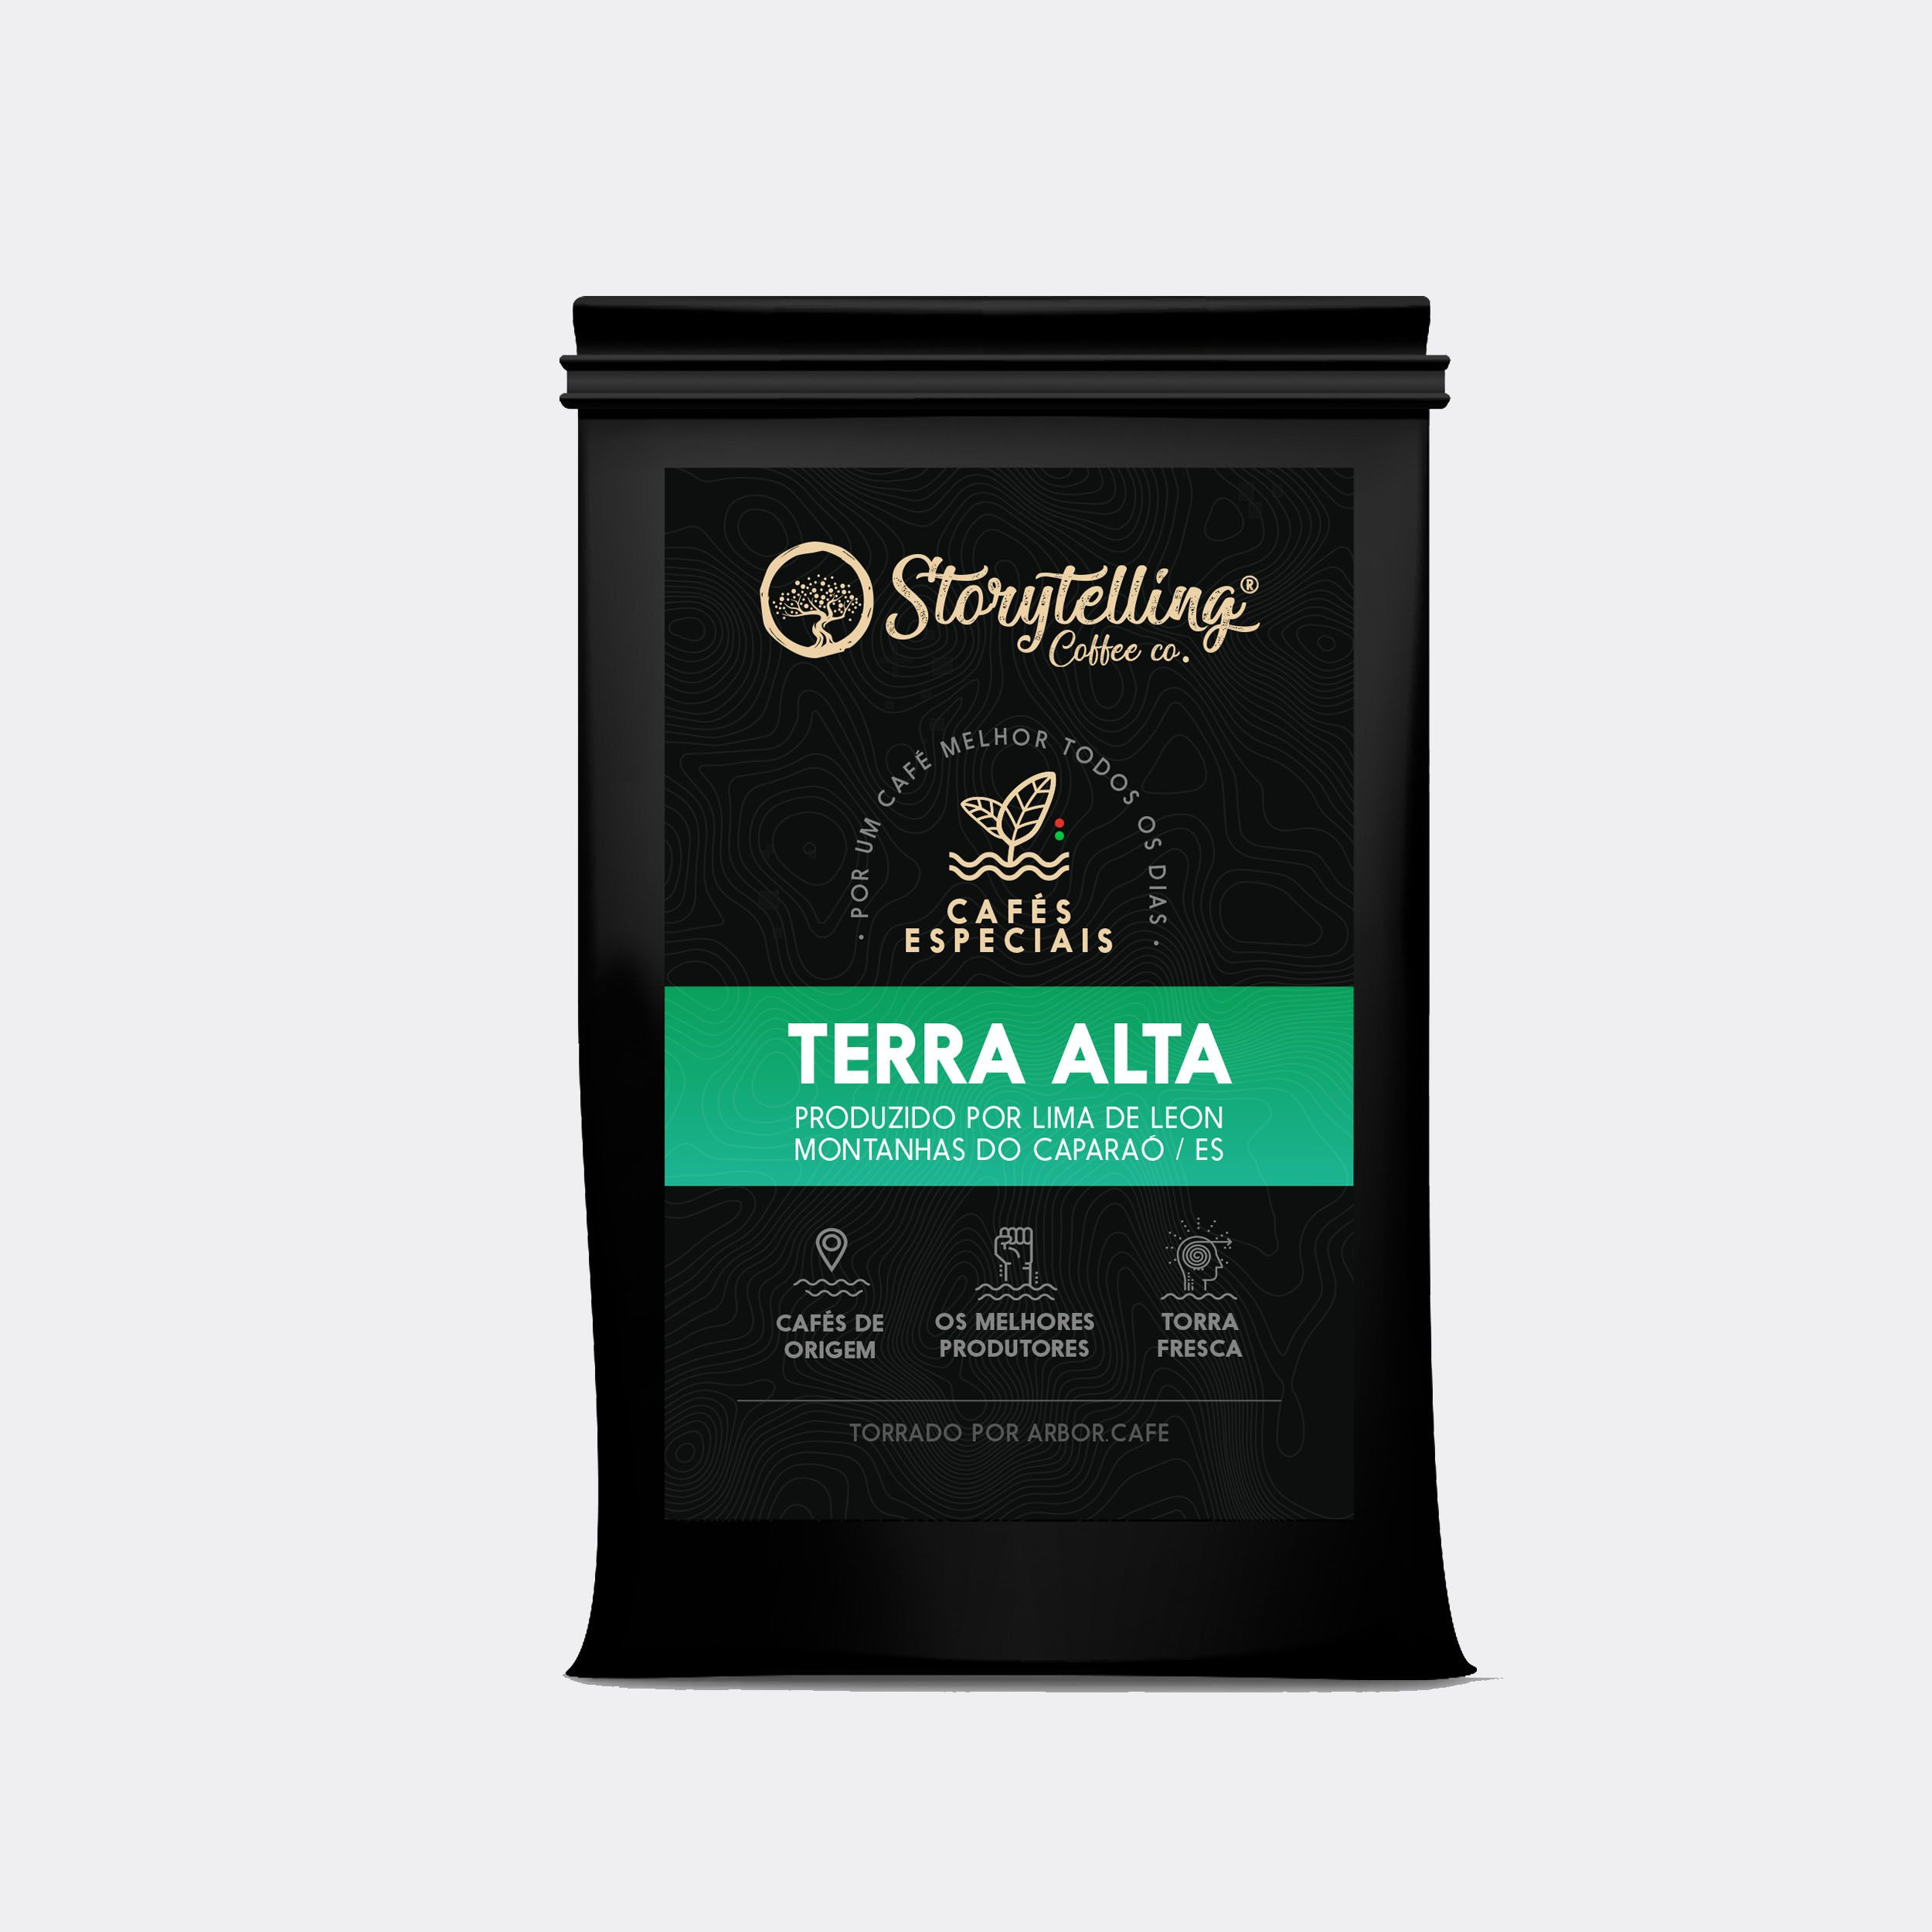 Café Terra Alta, 250g, Storytelling Coffee